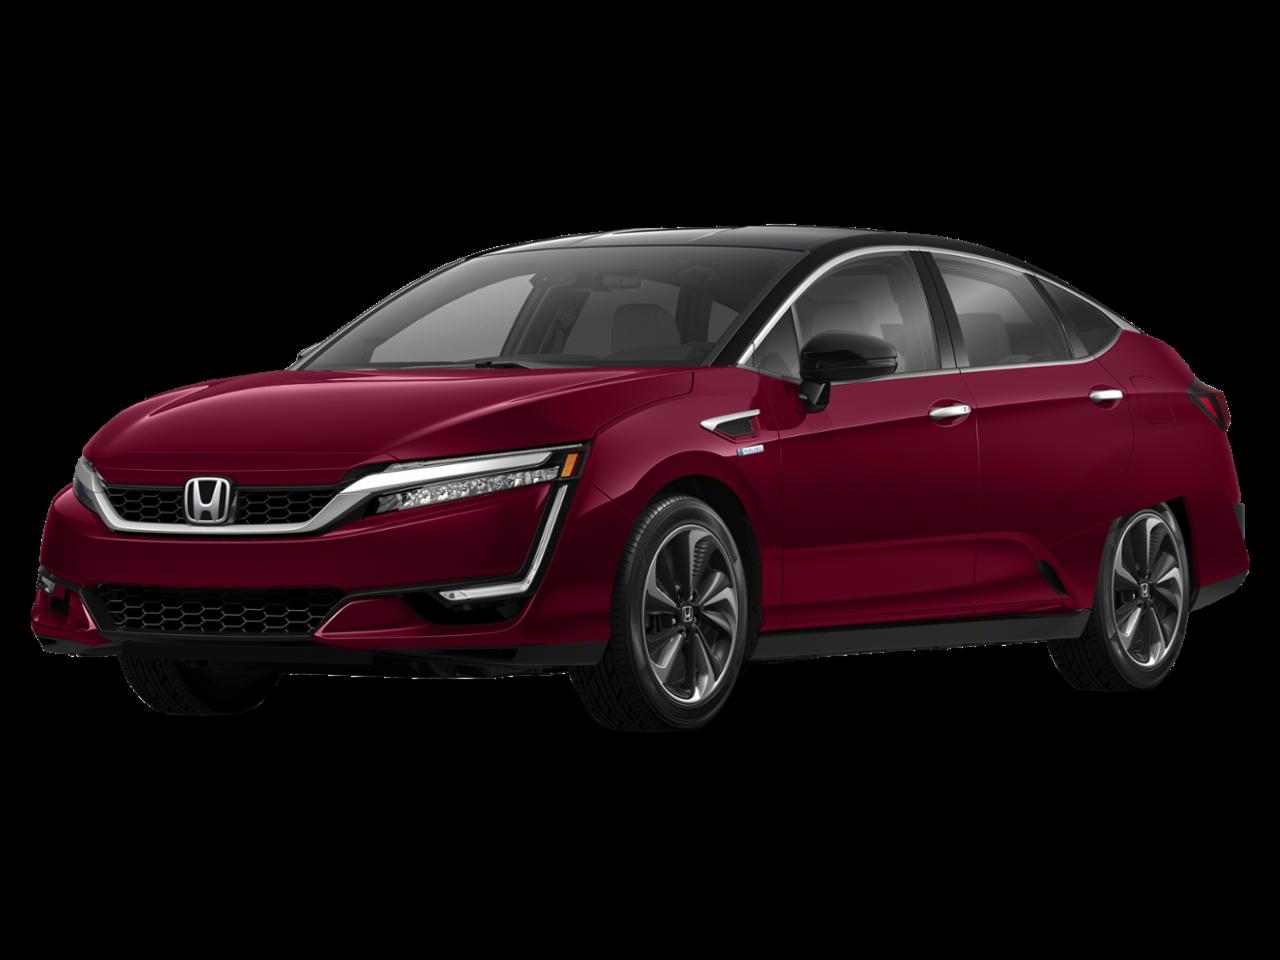 Honda 2020 Clarity Fuel Cell Sedan